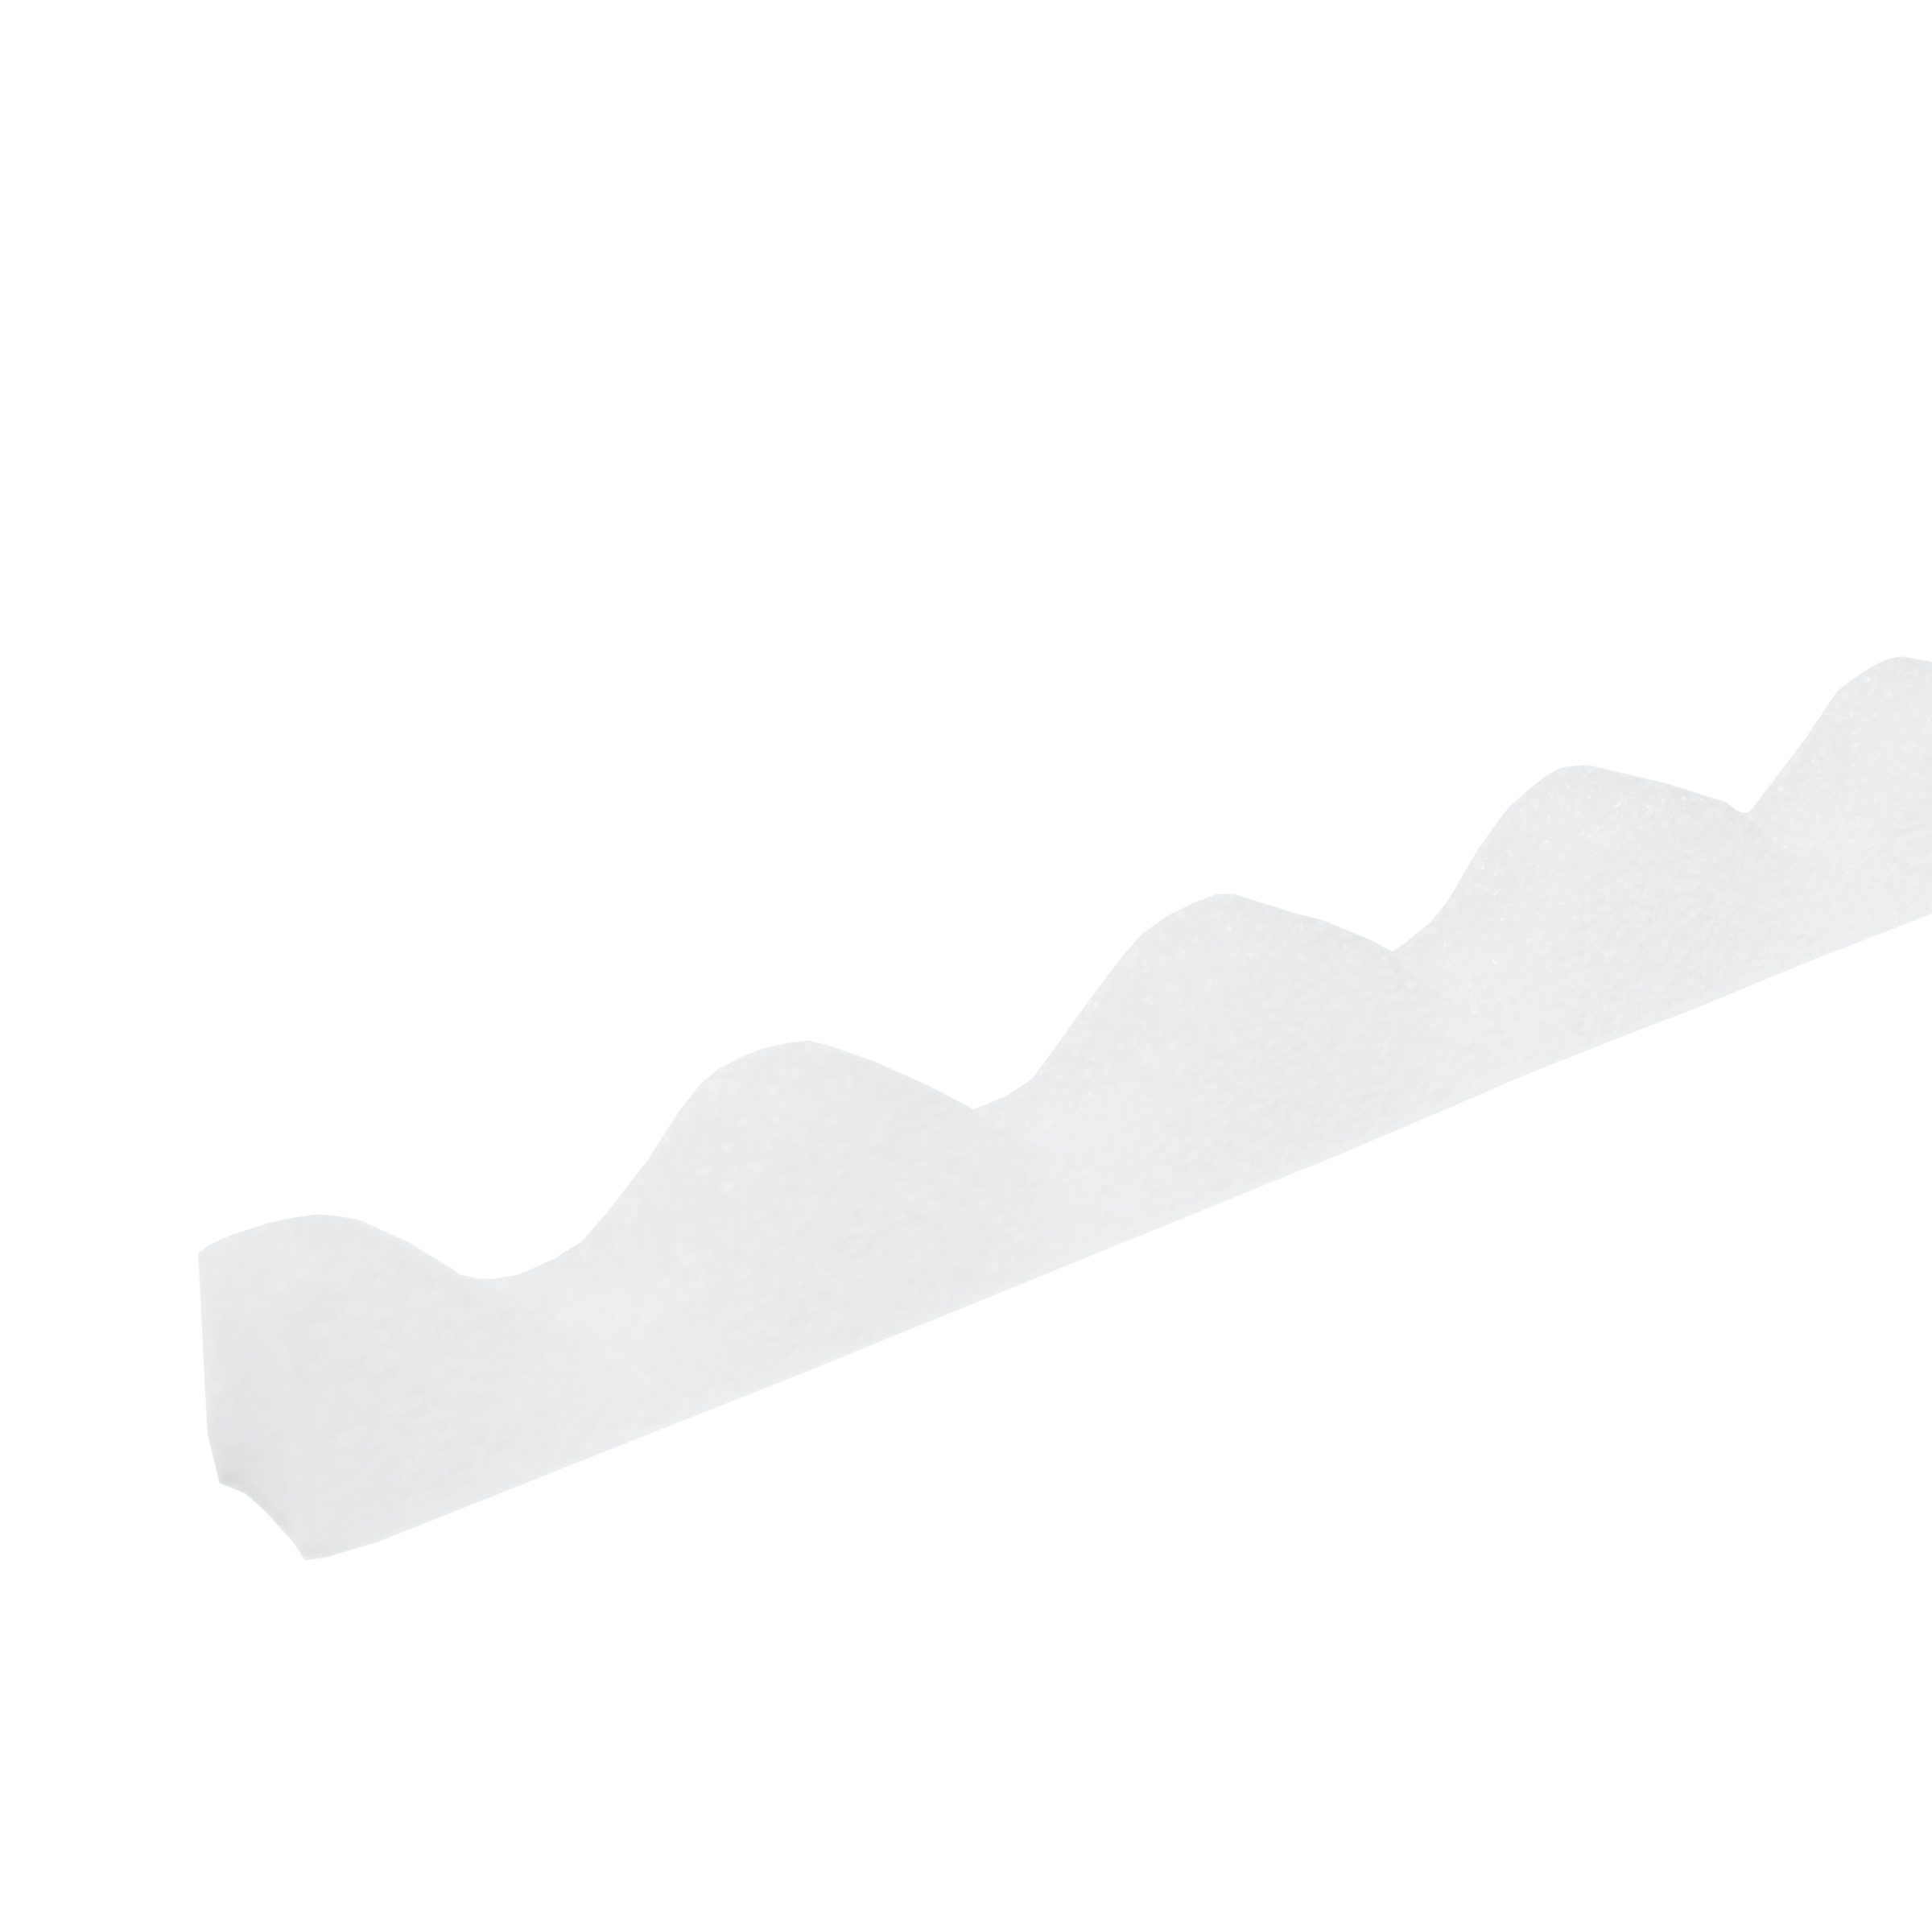 Martens afdichtingsprofiel onduline 1mtr